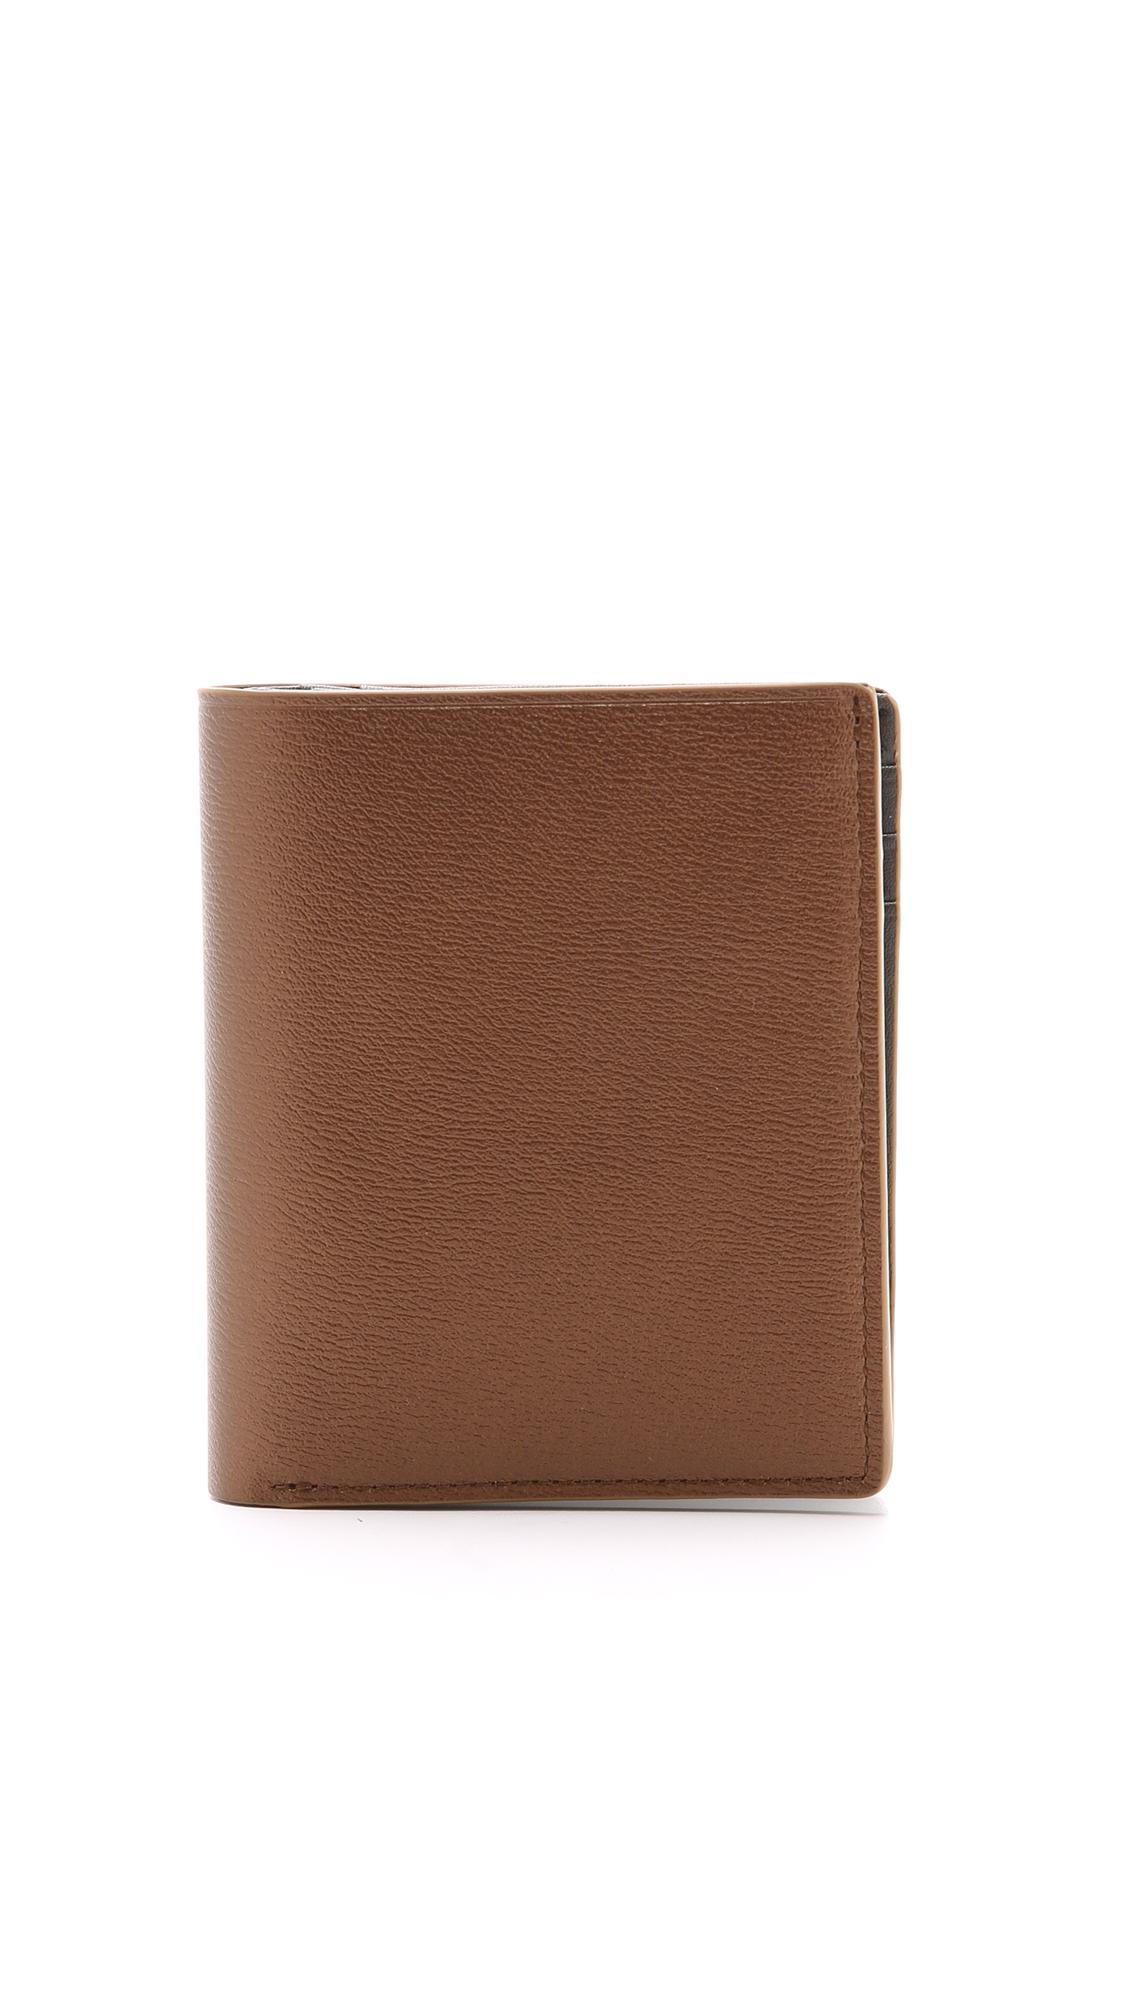 4dea54dfc3 WANT Les Essentiels Bradley Bifold Wallet